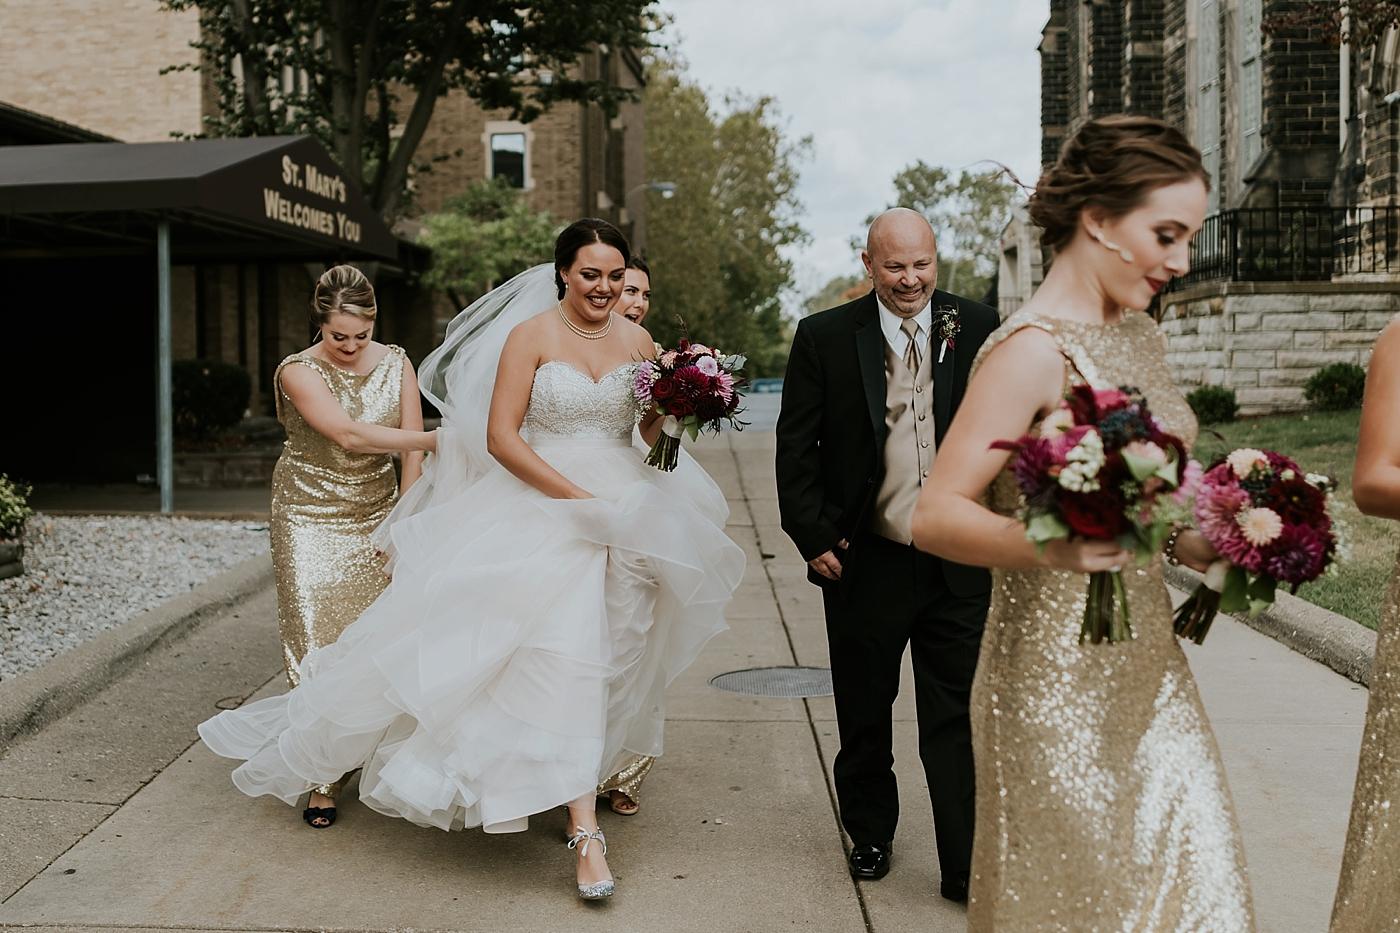 Ohio-Wedding_Kathryn+Devin_MJPHOTO2017-7.jpg